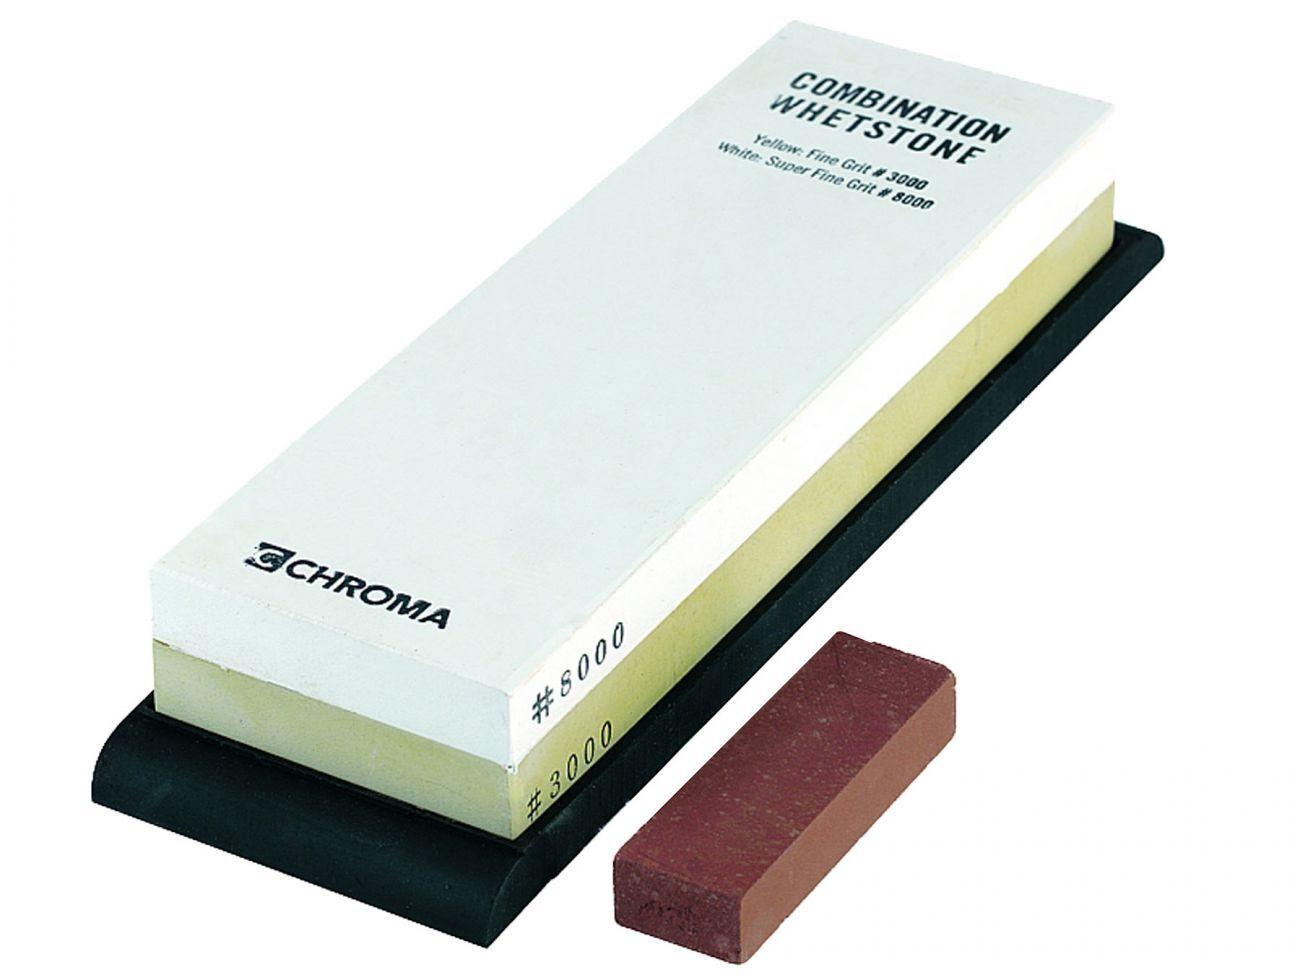 Chroma st-3 8 MEULE AFFUTAGE GRAIN 3000 8000